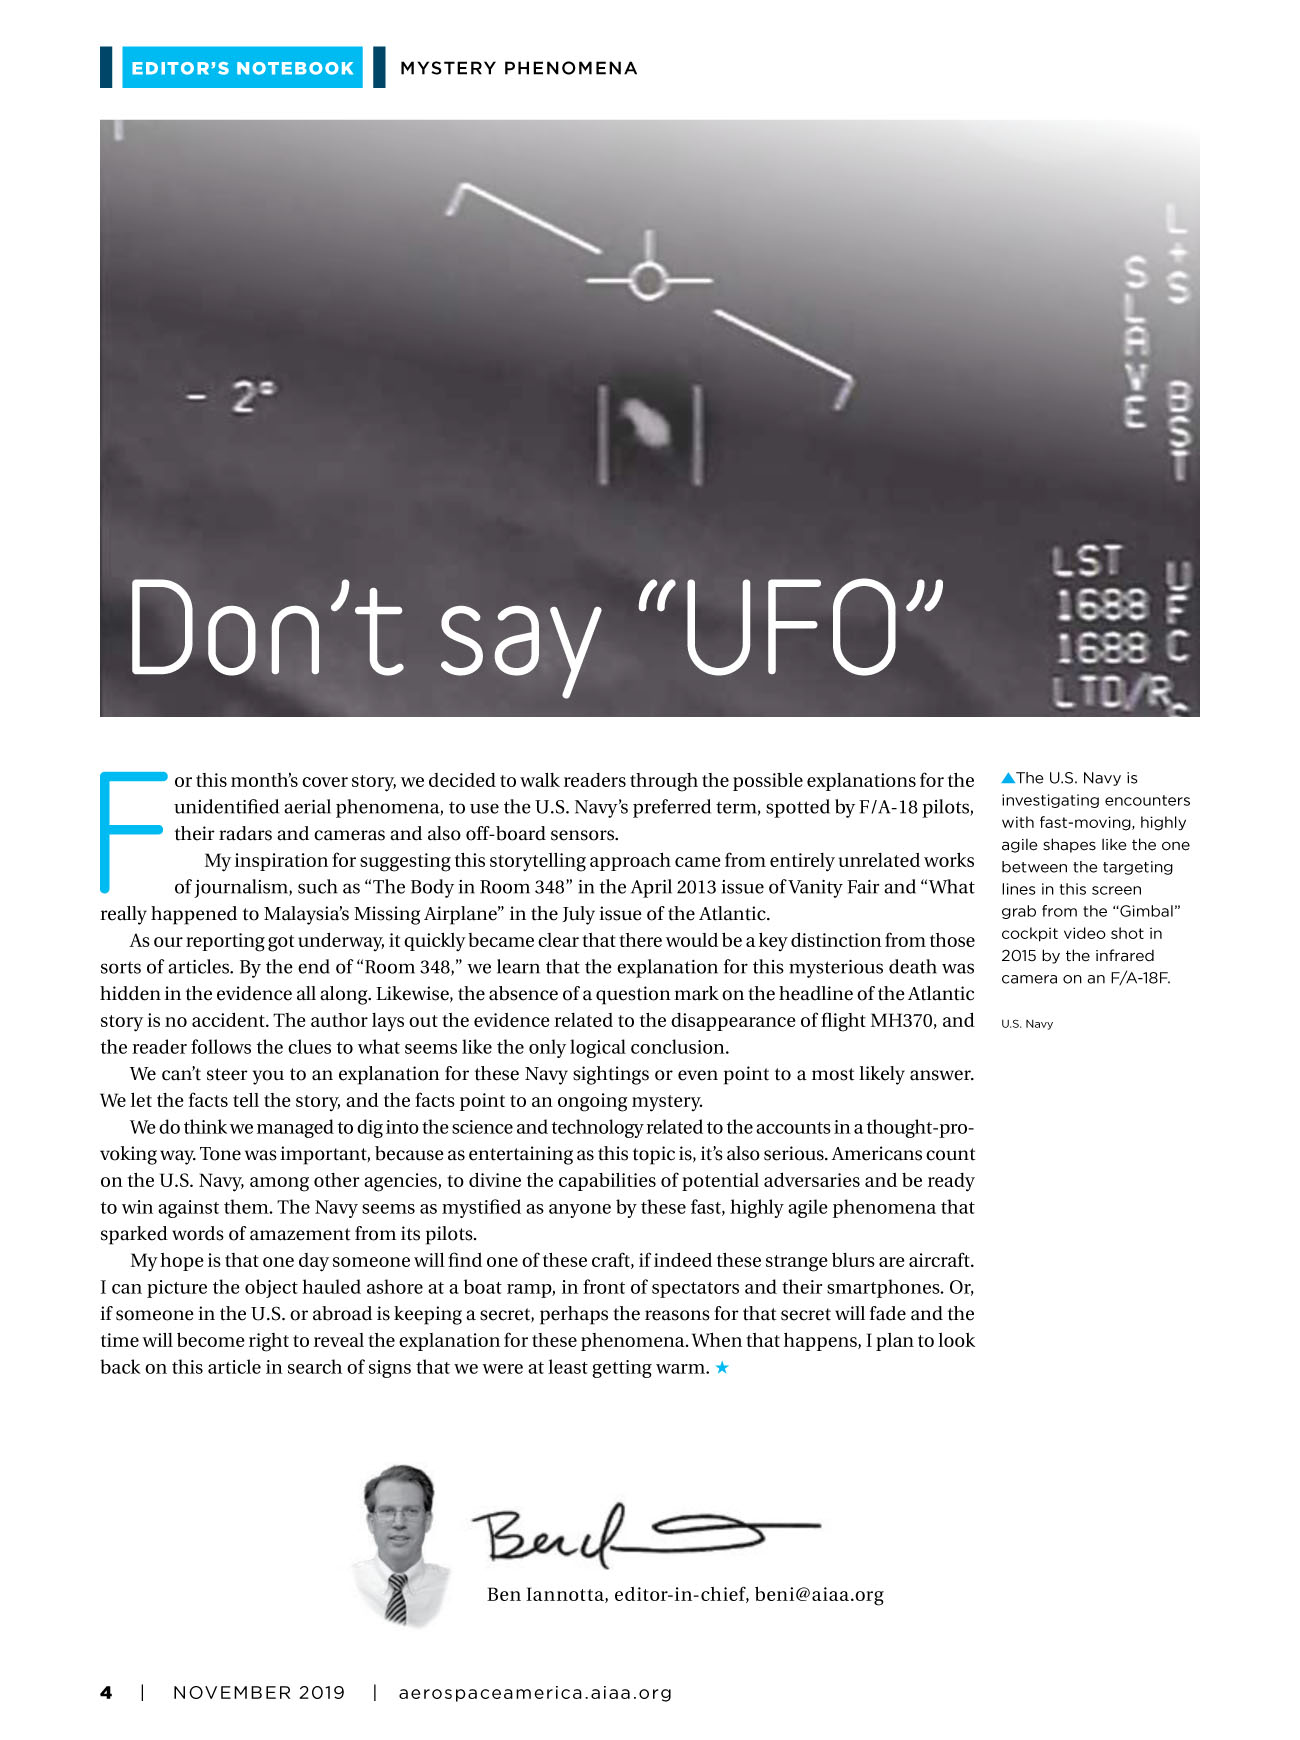 Aerospace America 2019-11 UFO 02.jpg